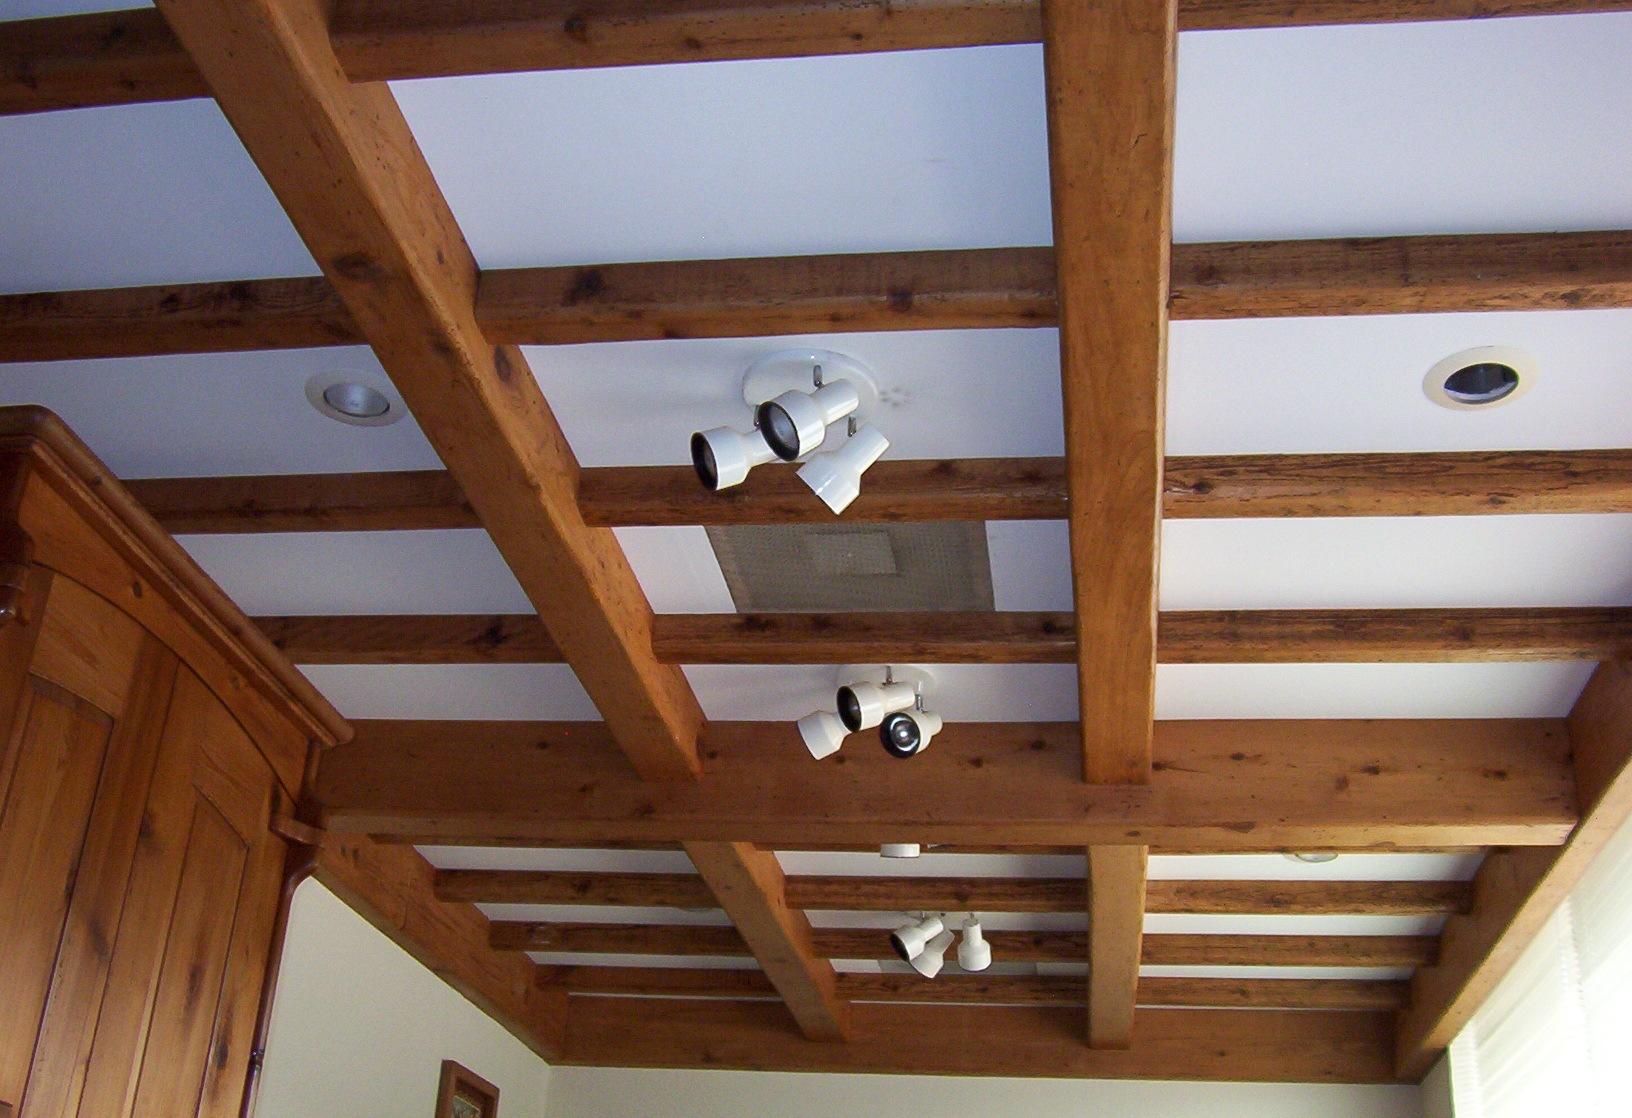 фальшбалки на потолок